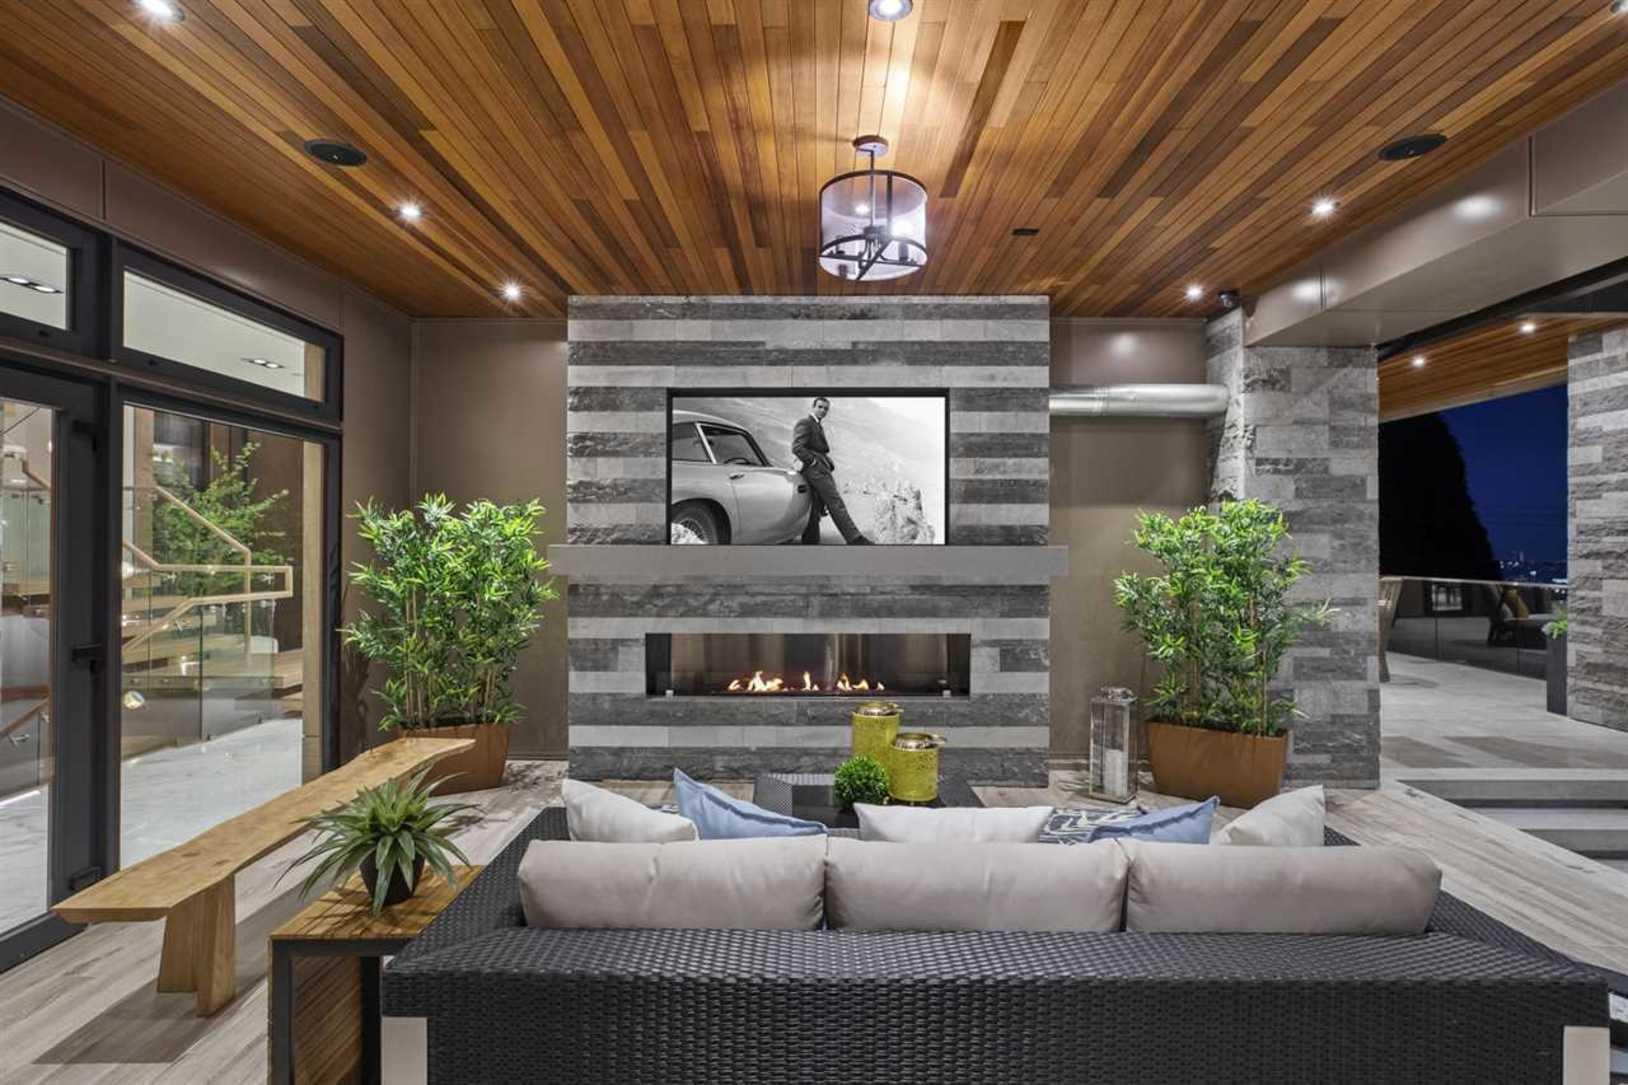 830-king-georges-way-british-properties-west-vancouver-12 at 830 King Georges Way, British Properties, West Vancouver